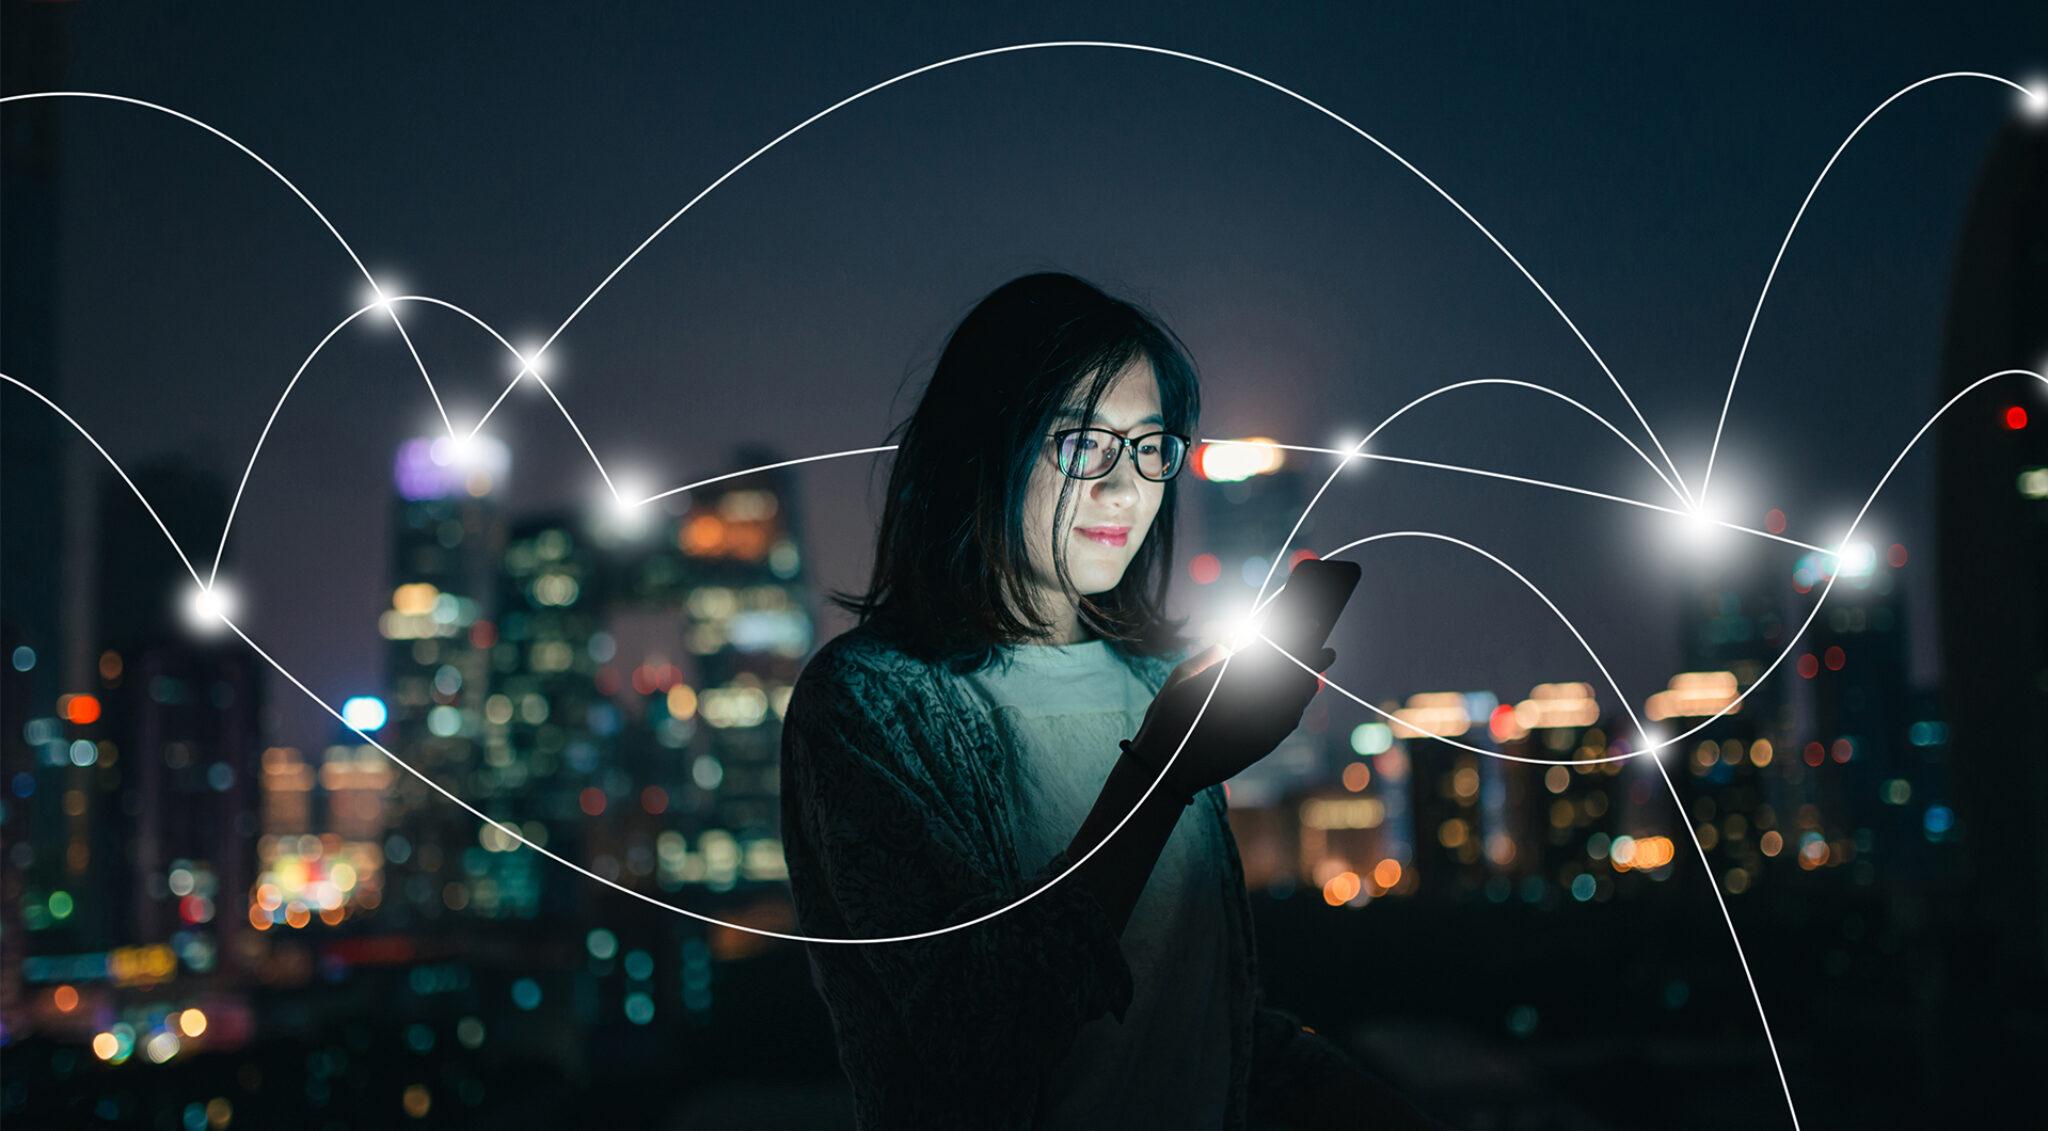 Junge Frau mit Handy vor beleuchteter Stadtkulisse.